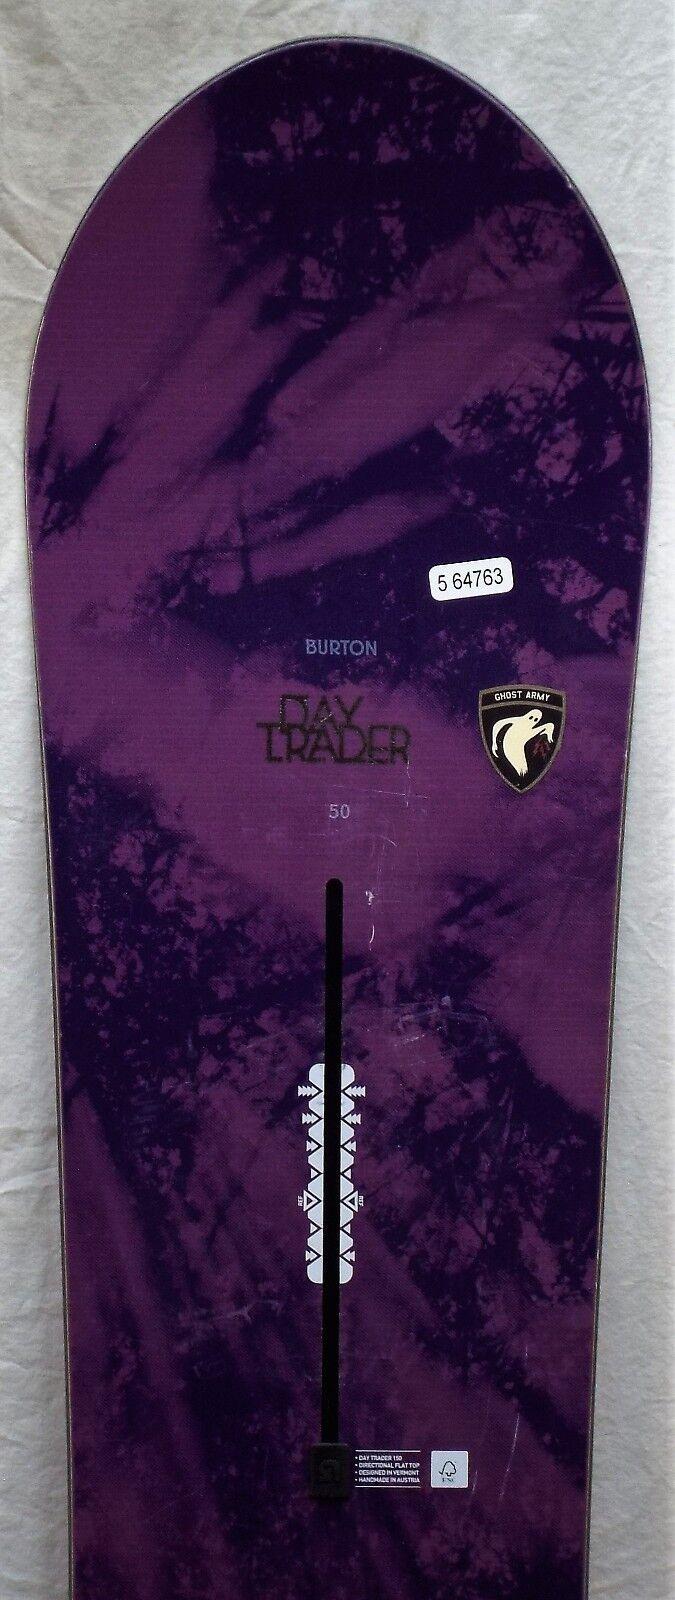 17-18 Burton Day  Trader Used Women's Demo Snowboard Size 150cm  discount